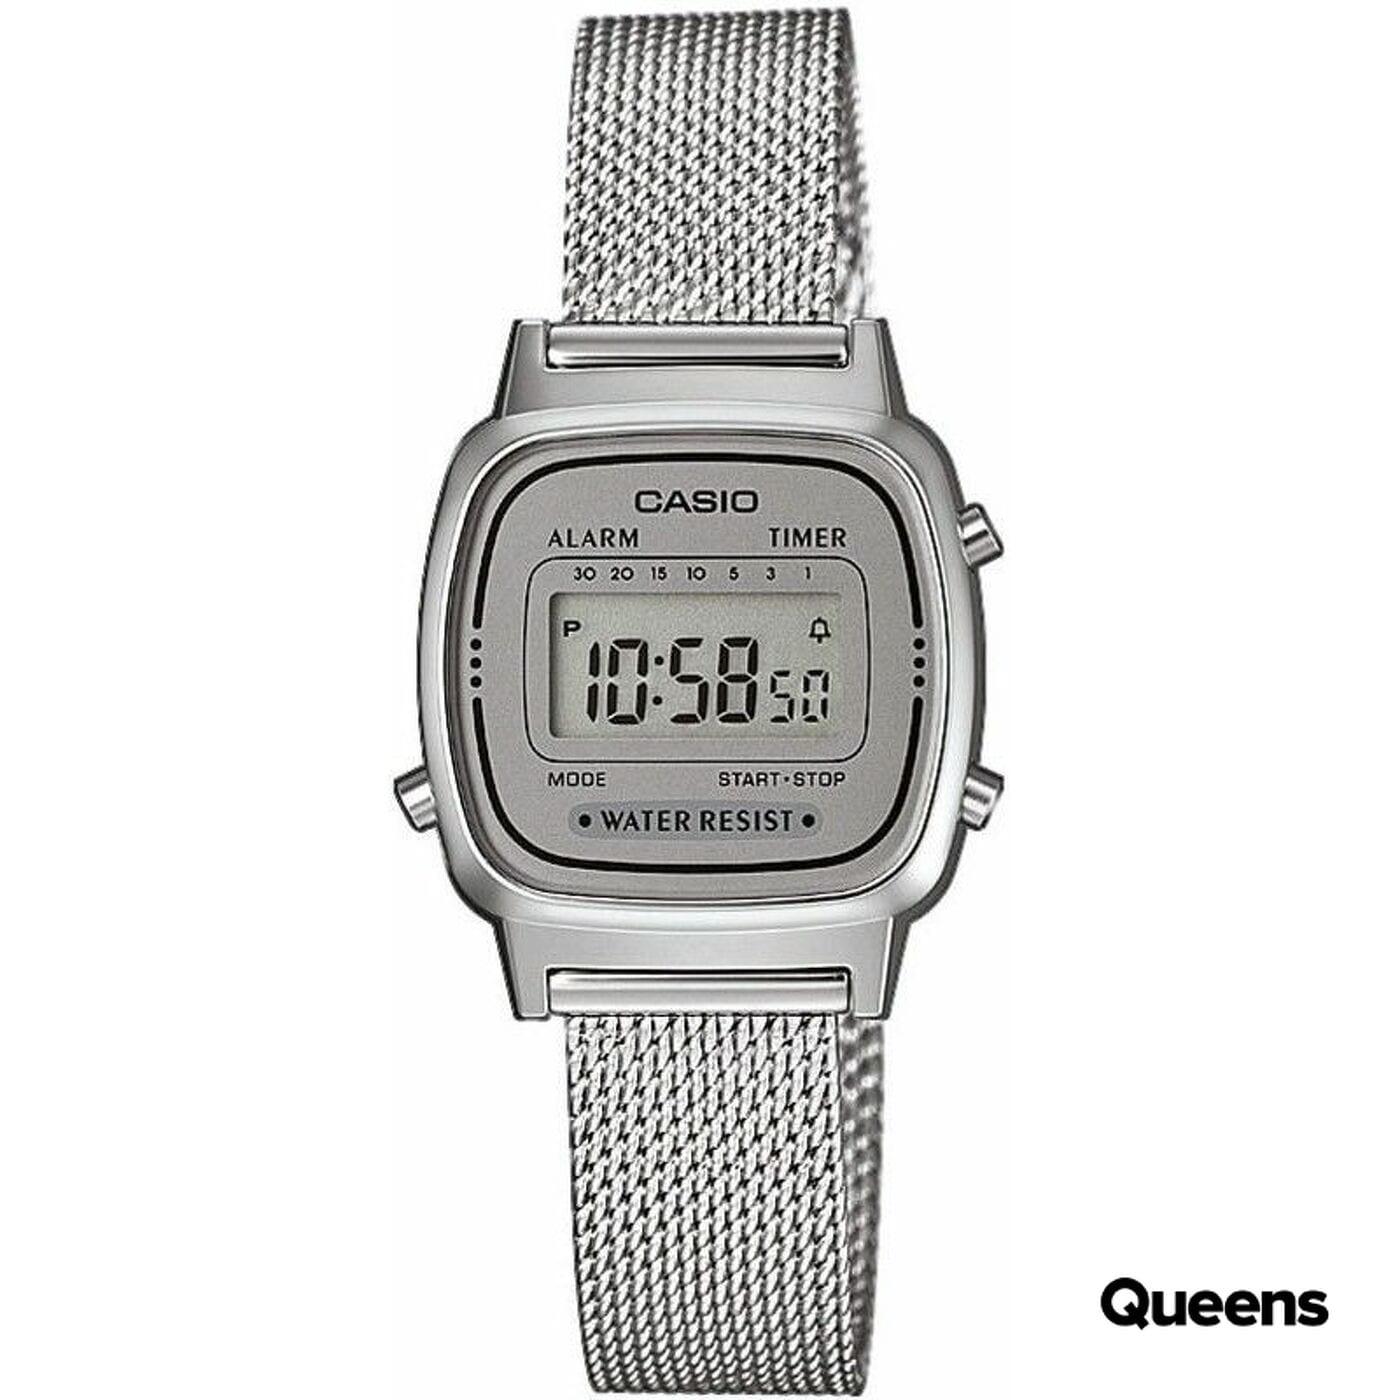 Casio LA 670WEM-7EF silver